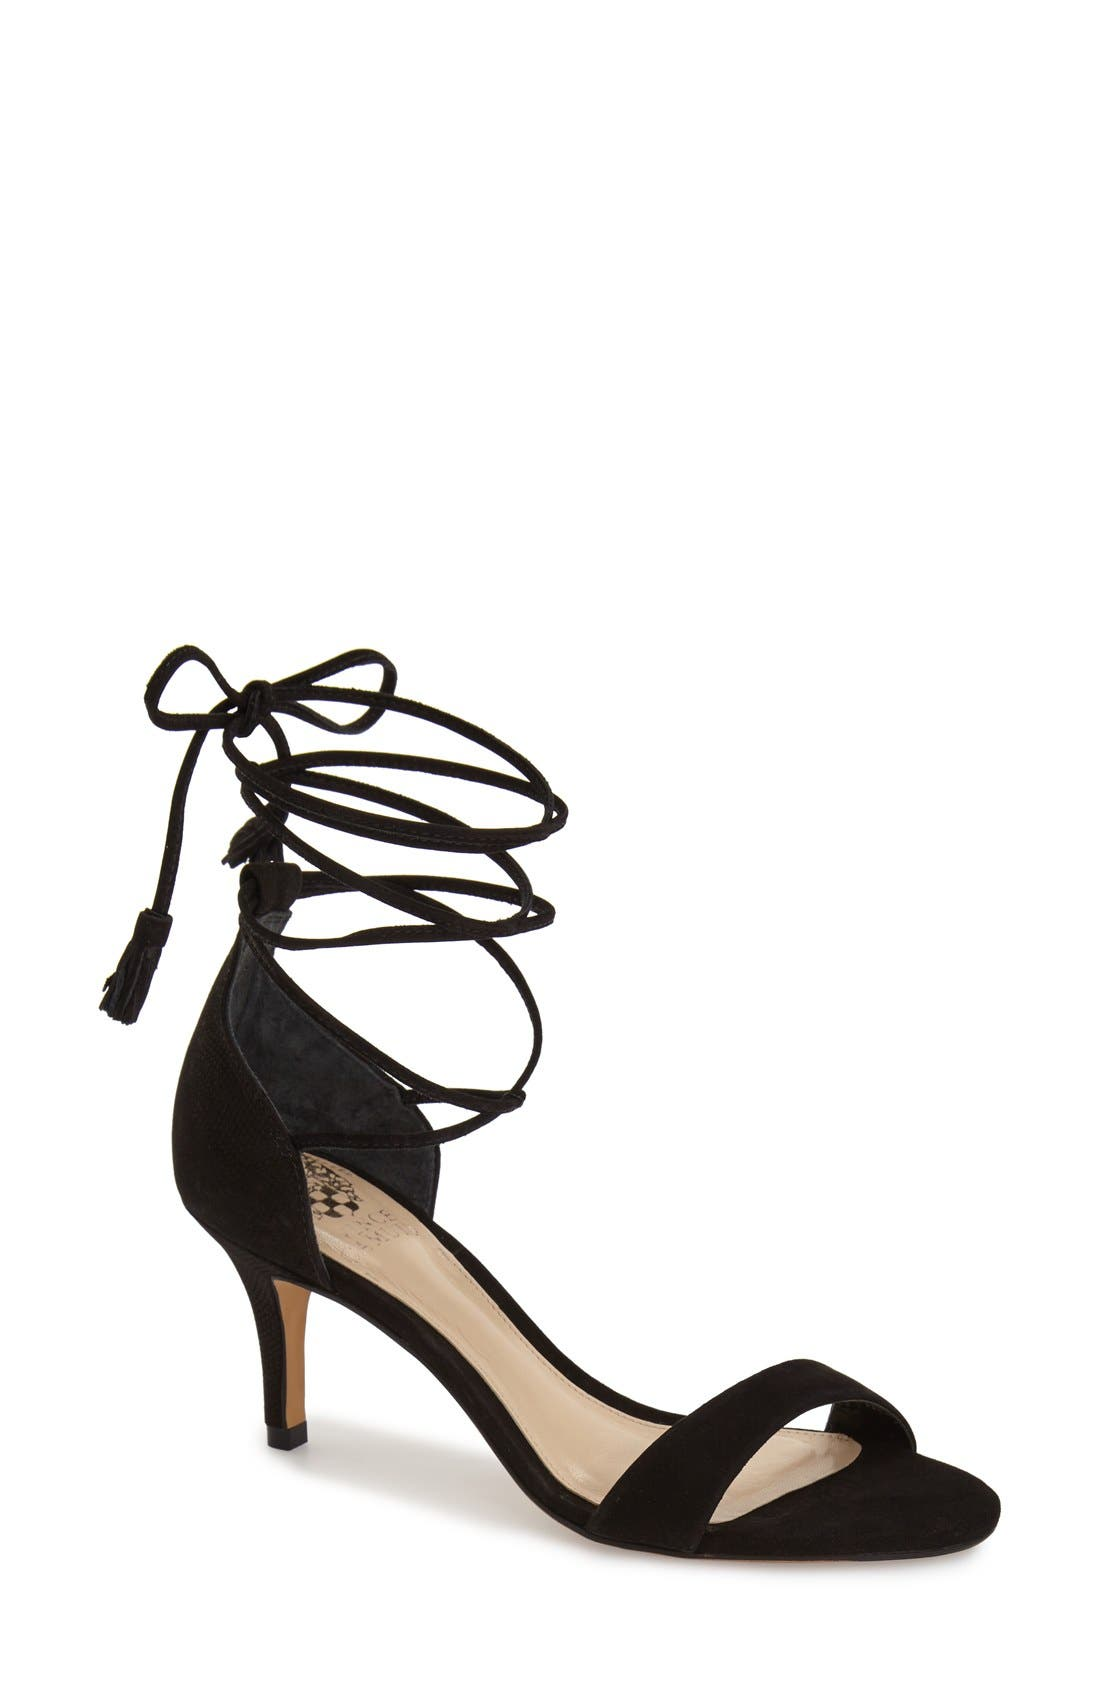 'Kathin' Lace-Up Sandal,                             Main thumbnail 1, color,                             001